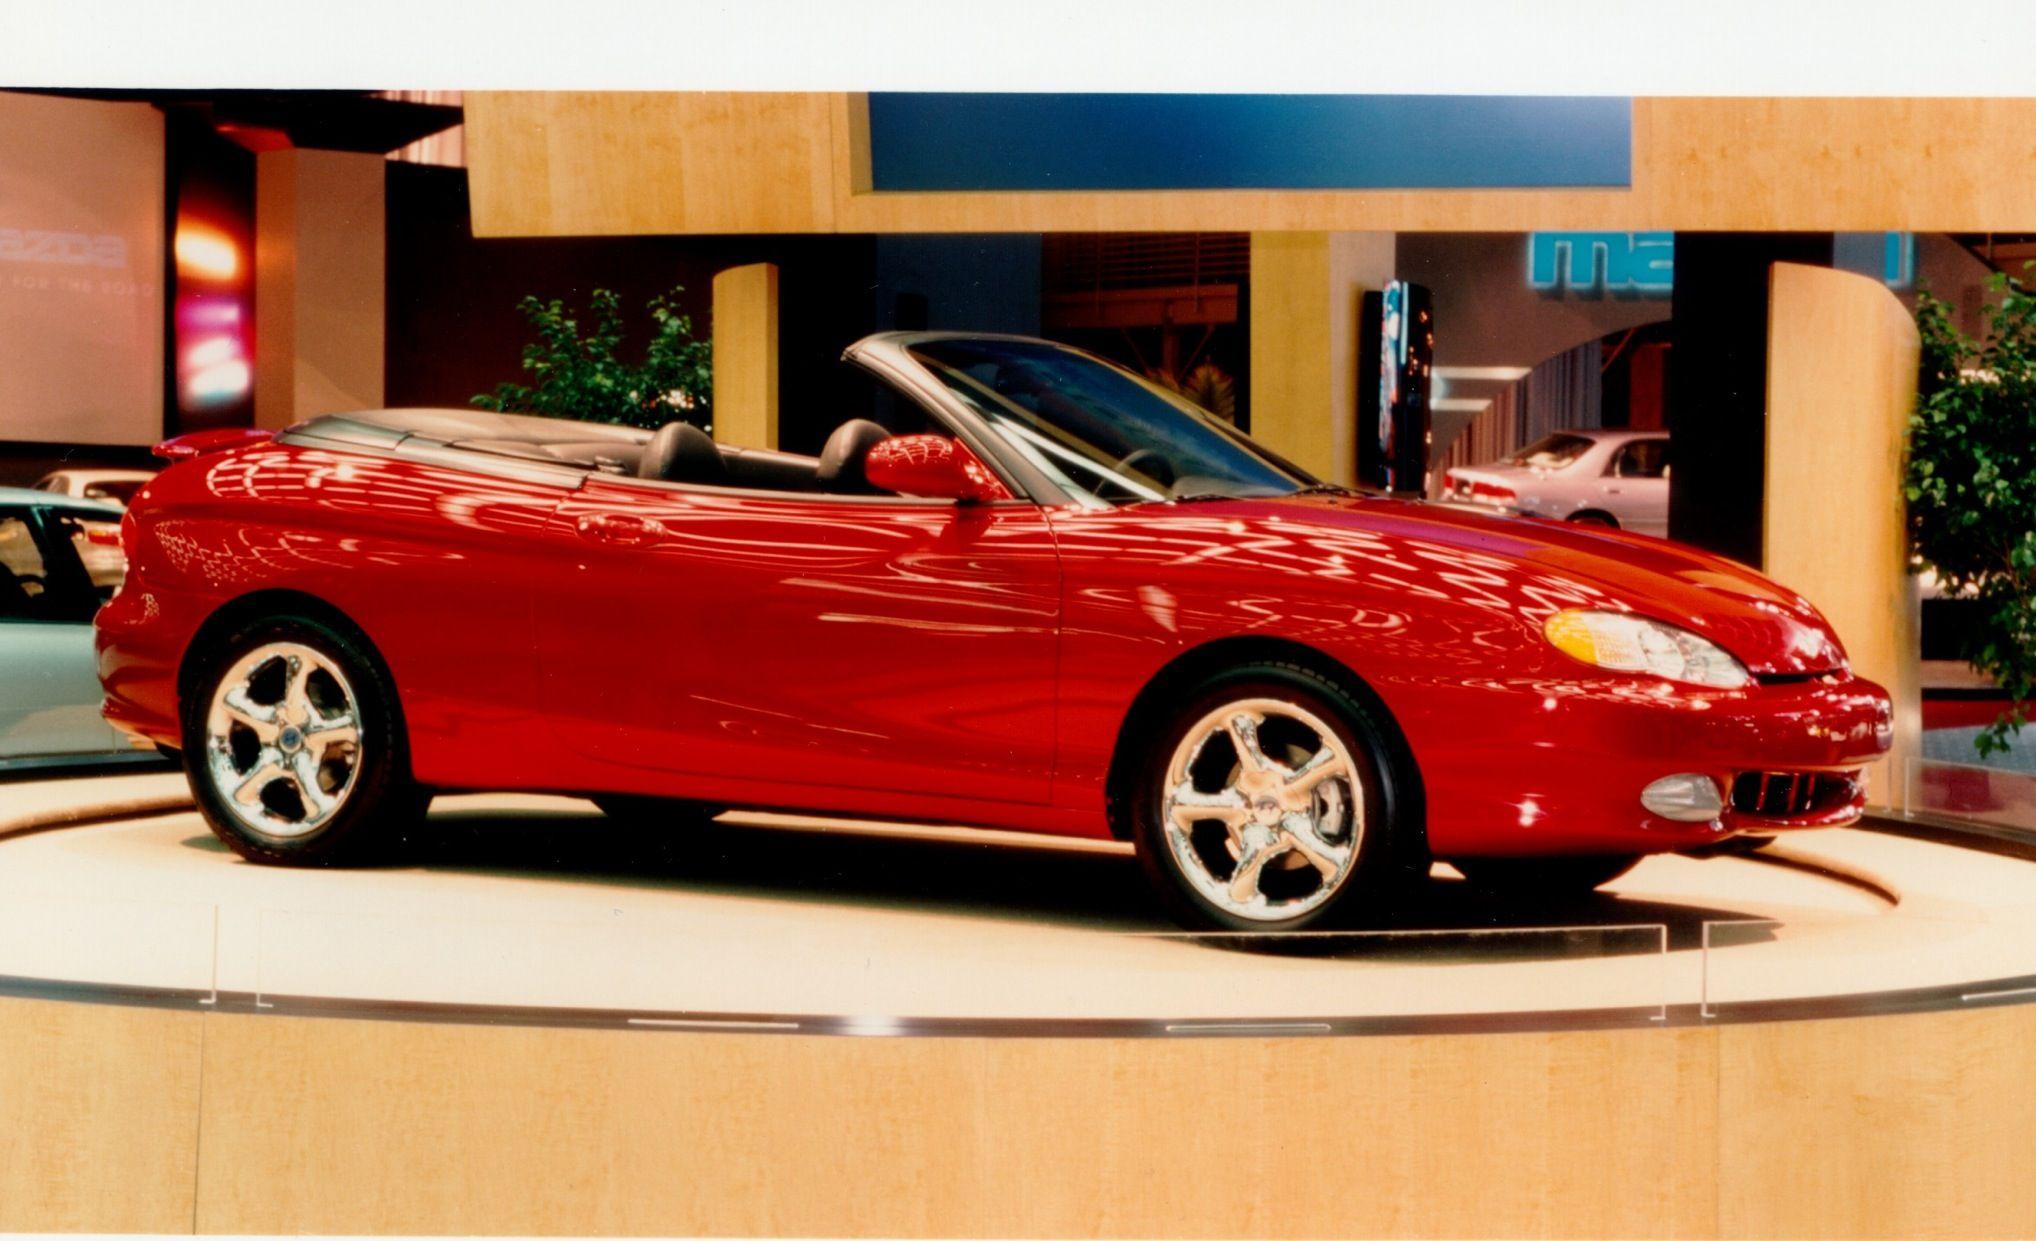 Hyundai Coupe Cabriolet Concept